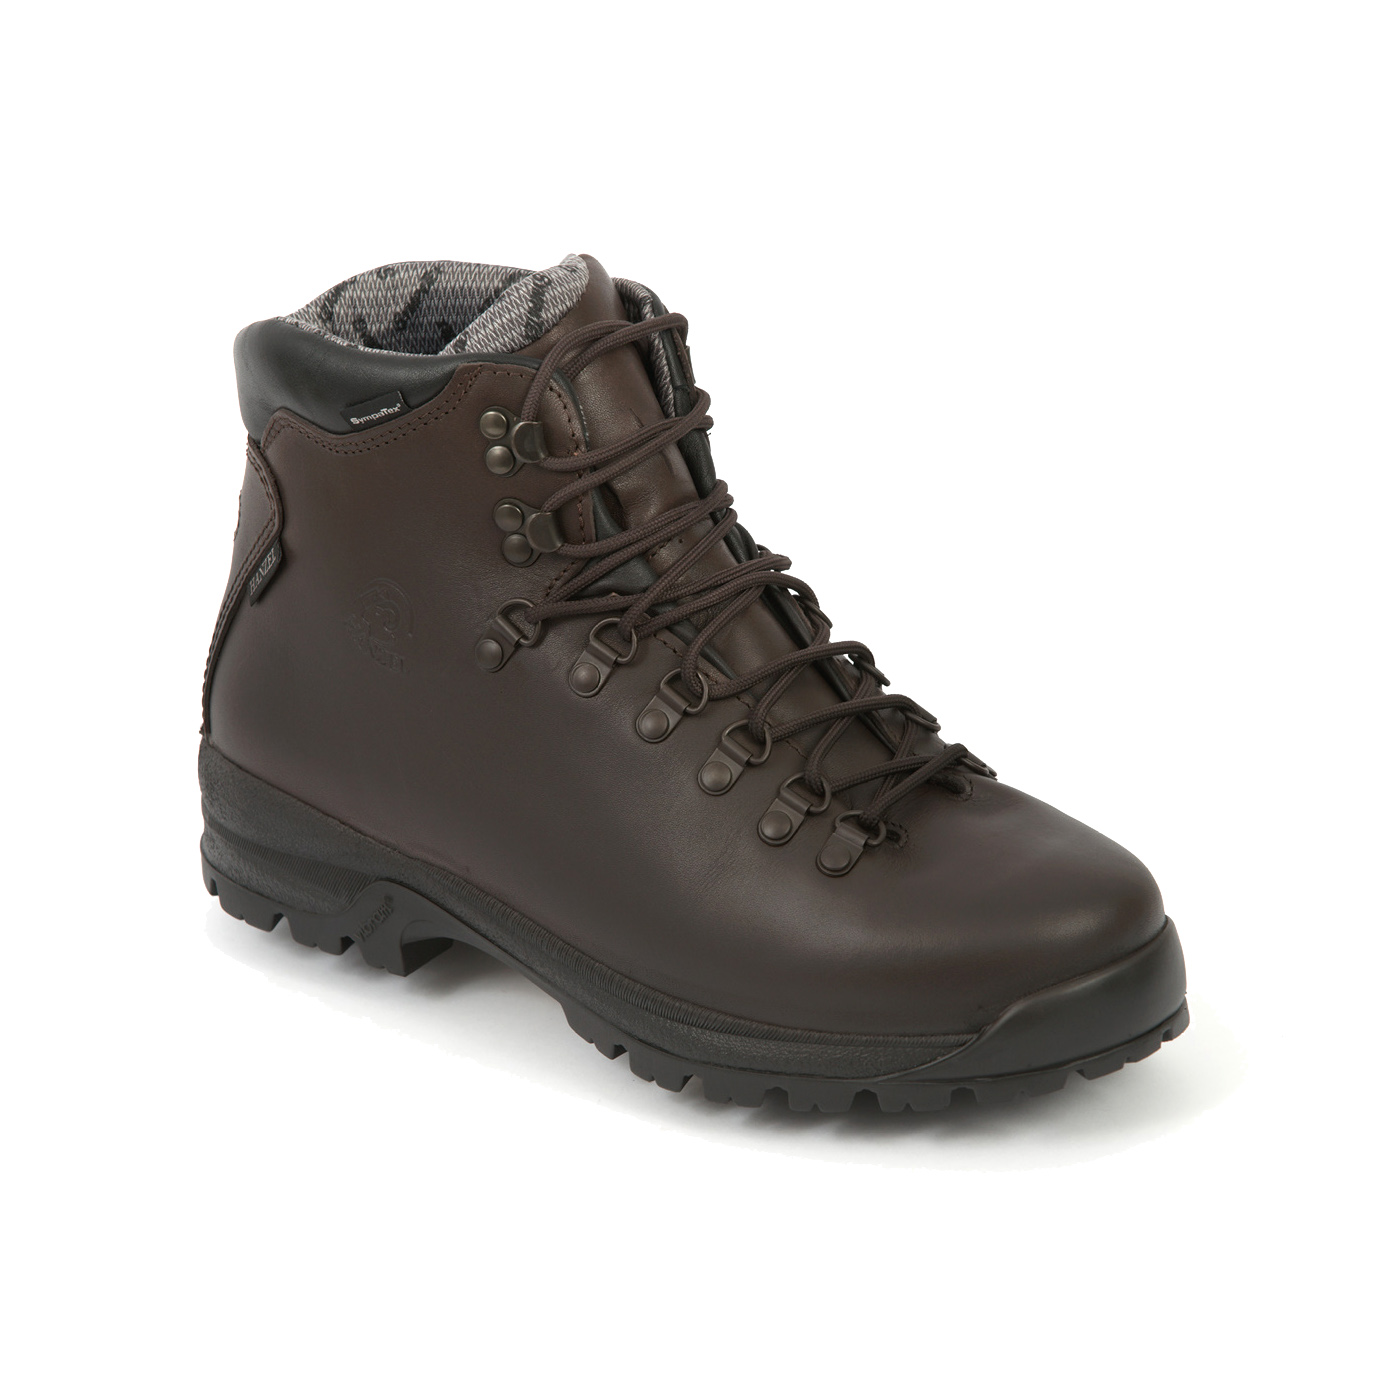 20f4b5463fb9 Turistická obuv